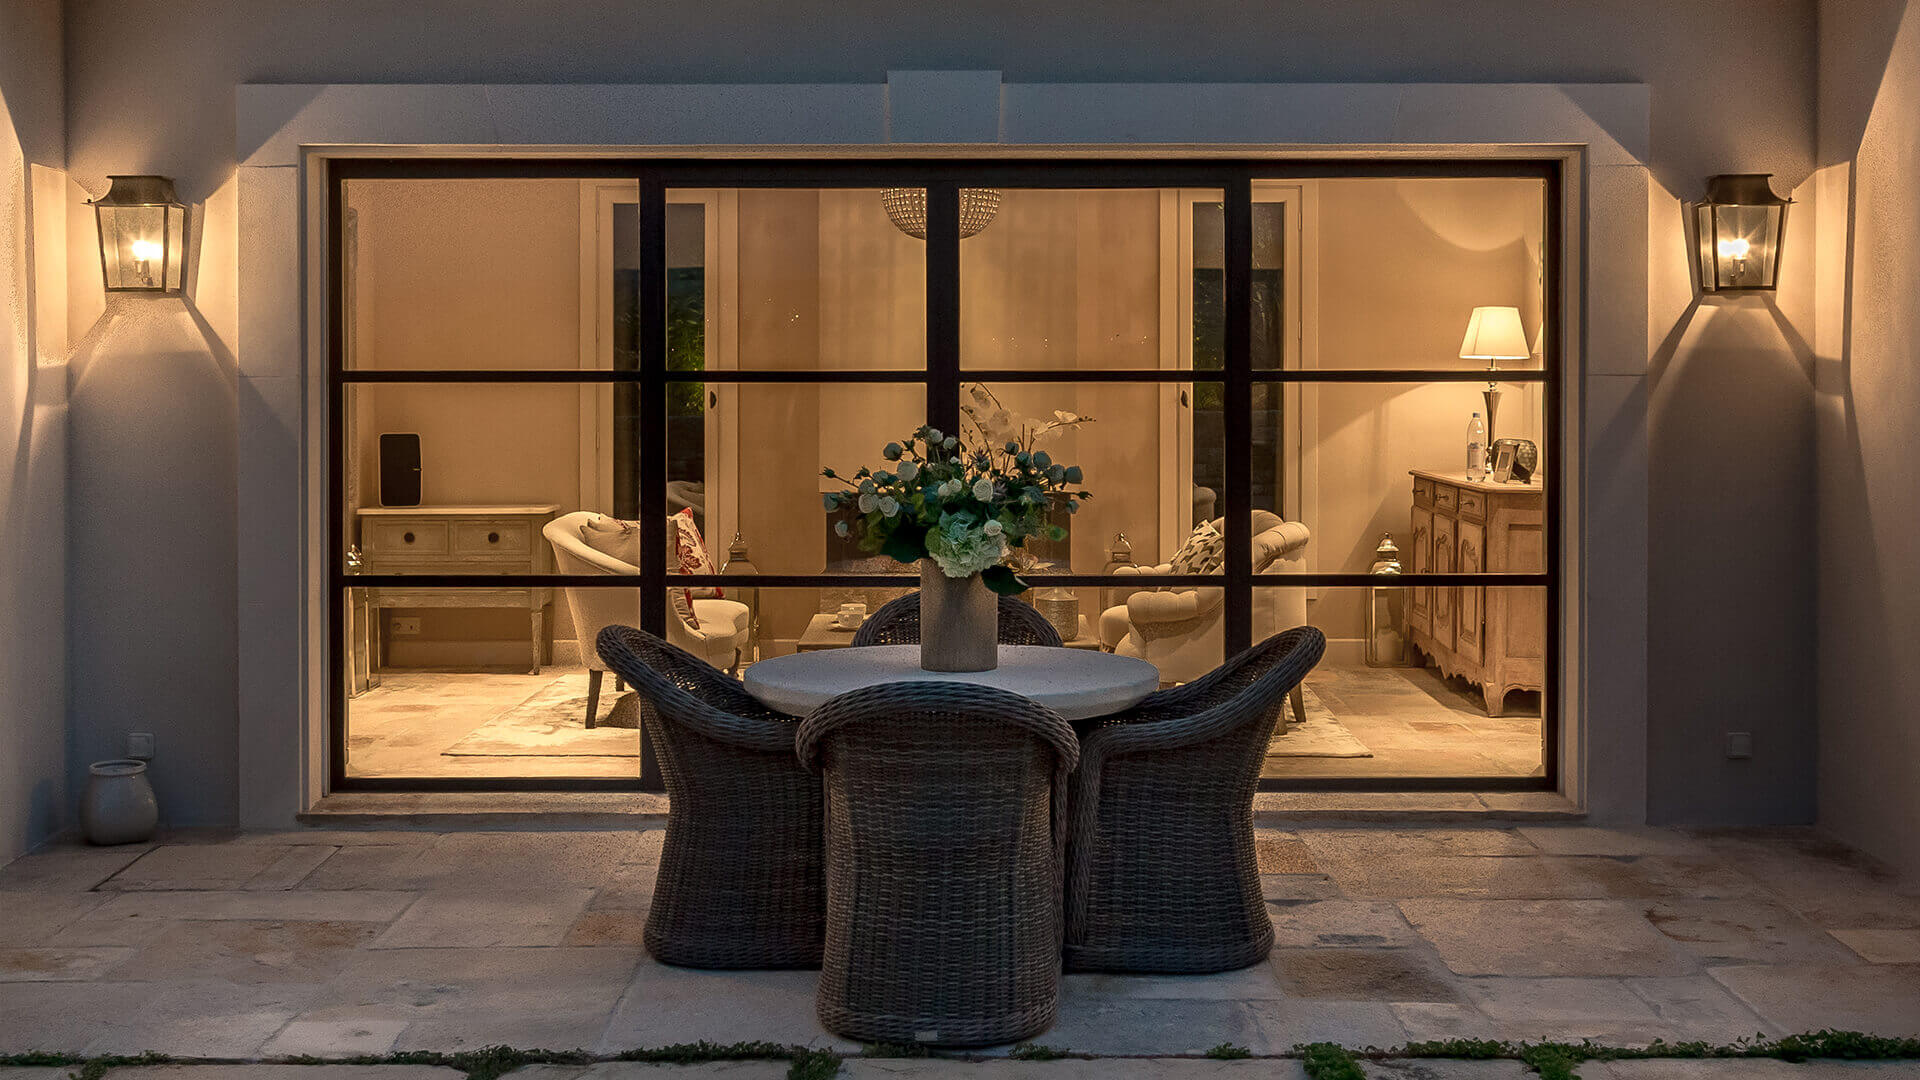 Villa Fayence patio and living room at night